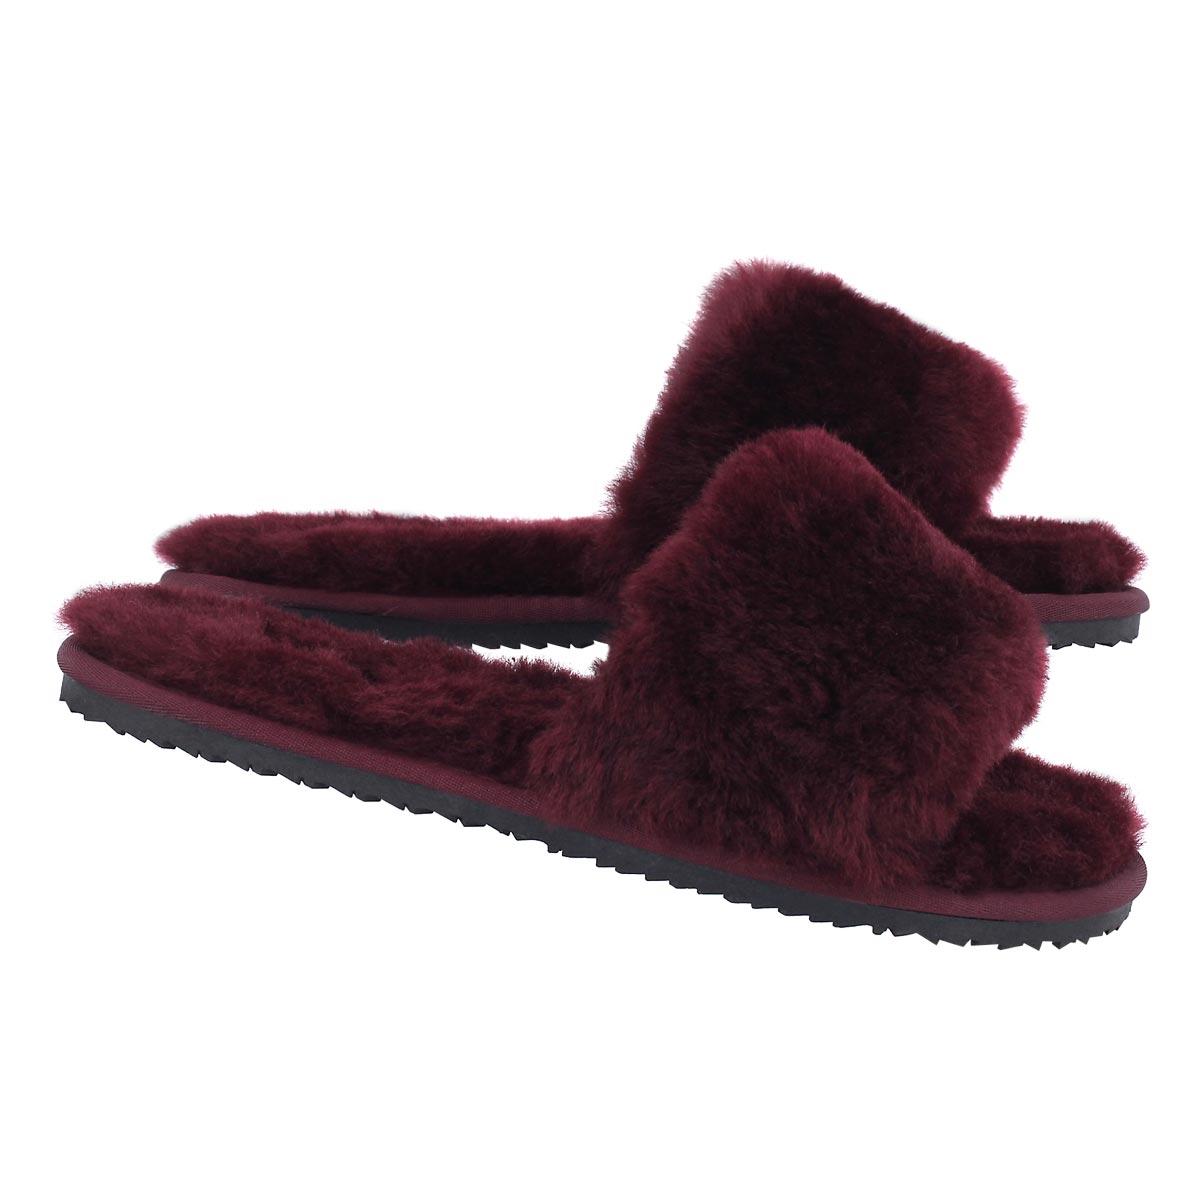 Lds Eugenie bgdyshearliing slide slipper